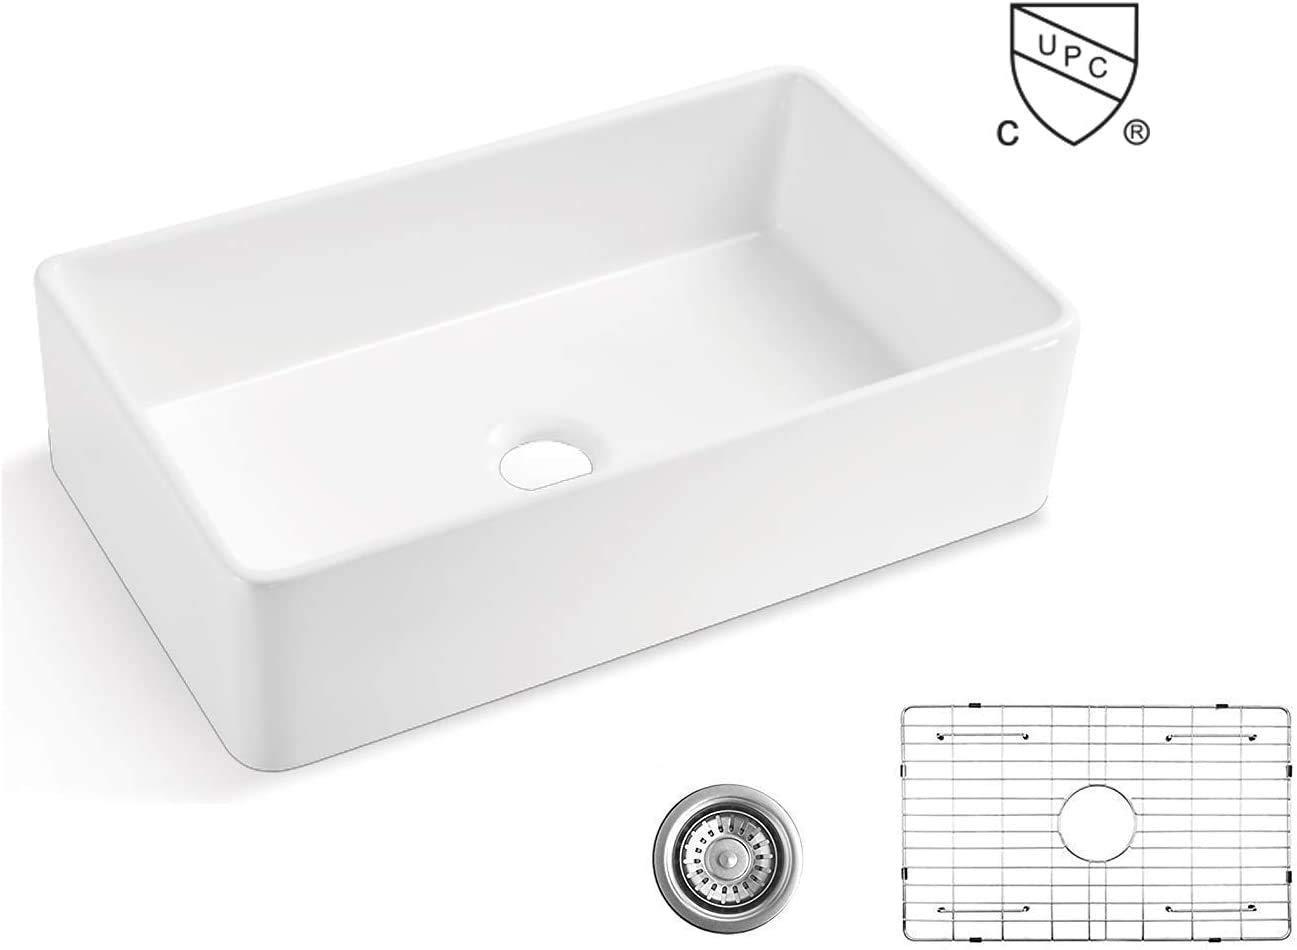 ALWEN 33 White Farmhouse Sink, Fireclay 33 Apron Front sink, Luxury Single Basin Kitchen Sink, 33 inch Farmhouse Sink, White Ceramic Sink with Stainless Steel Grid and Strainer